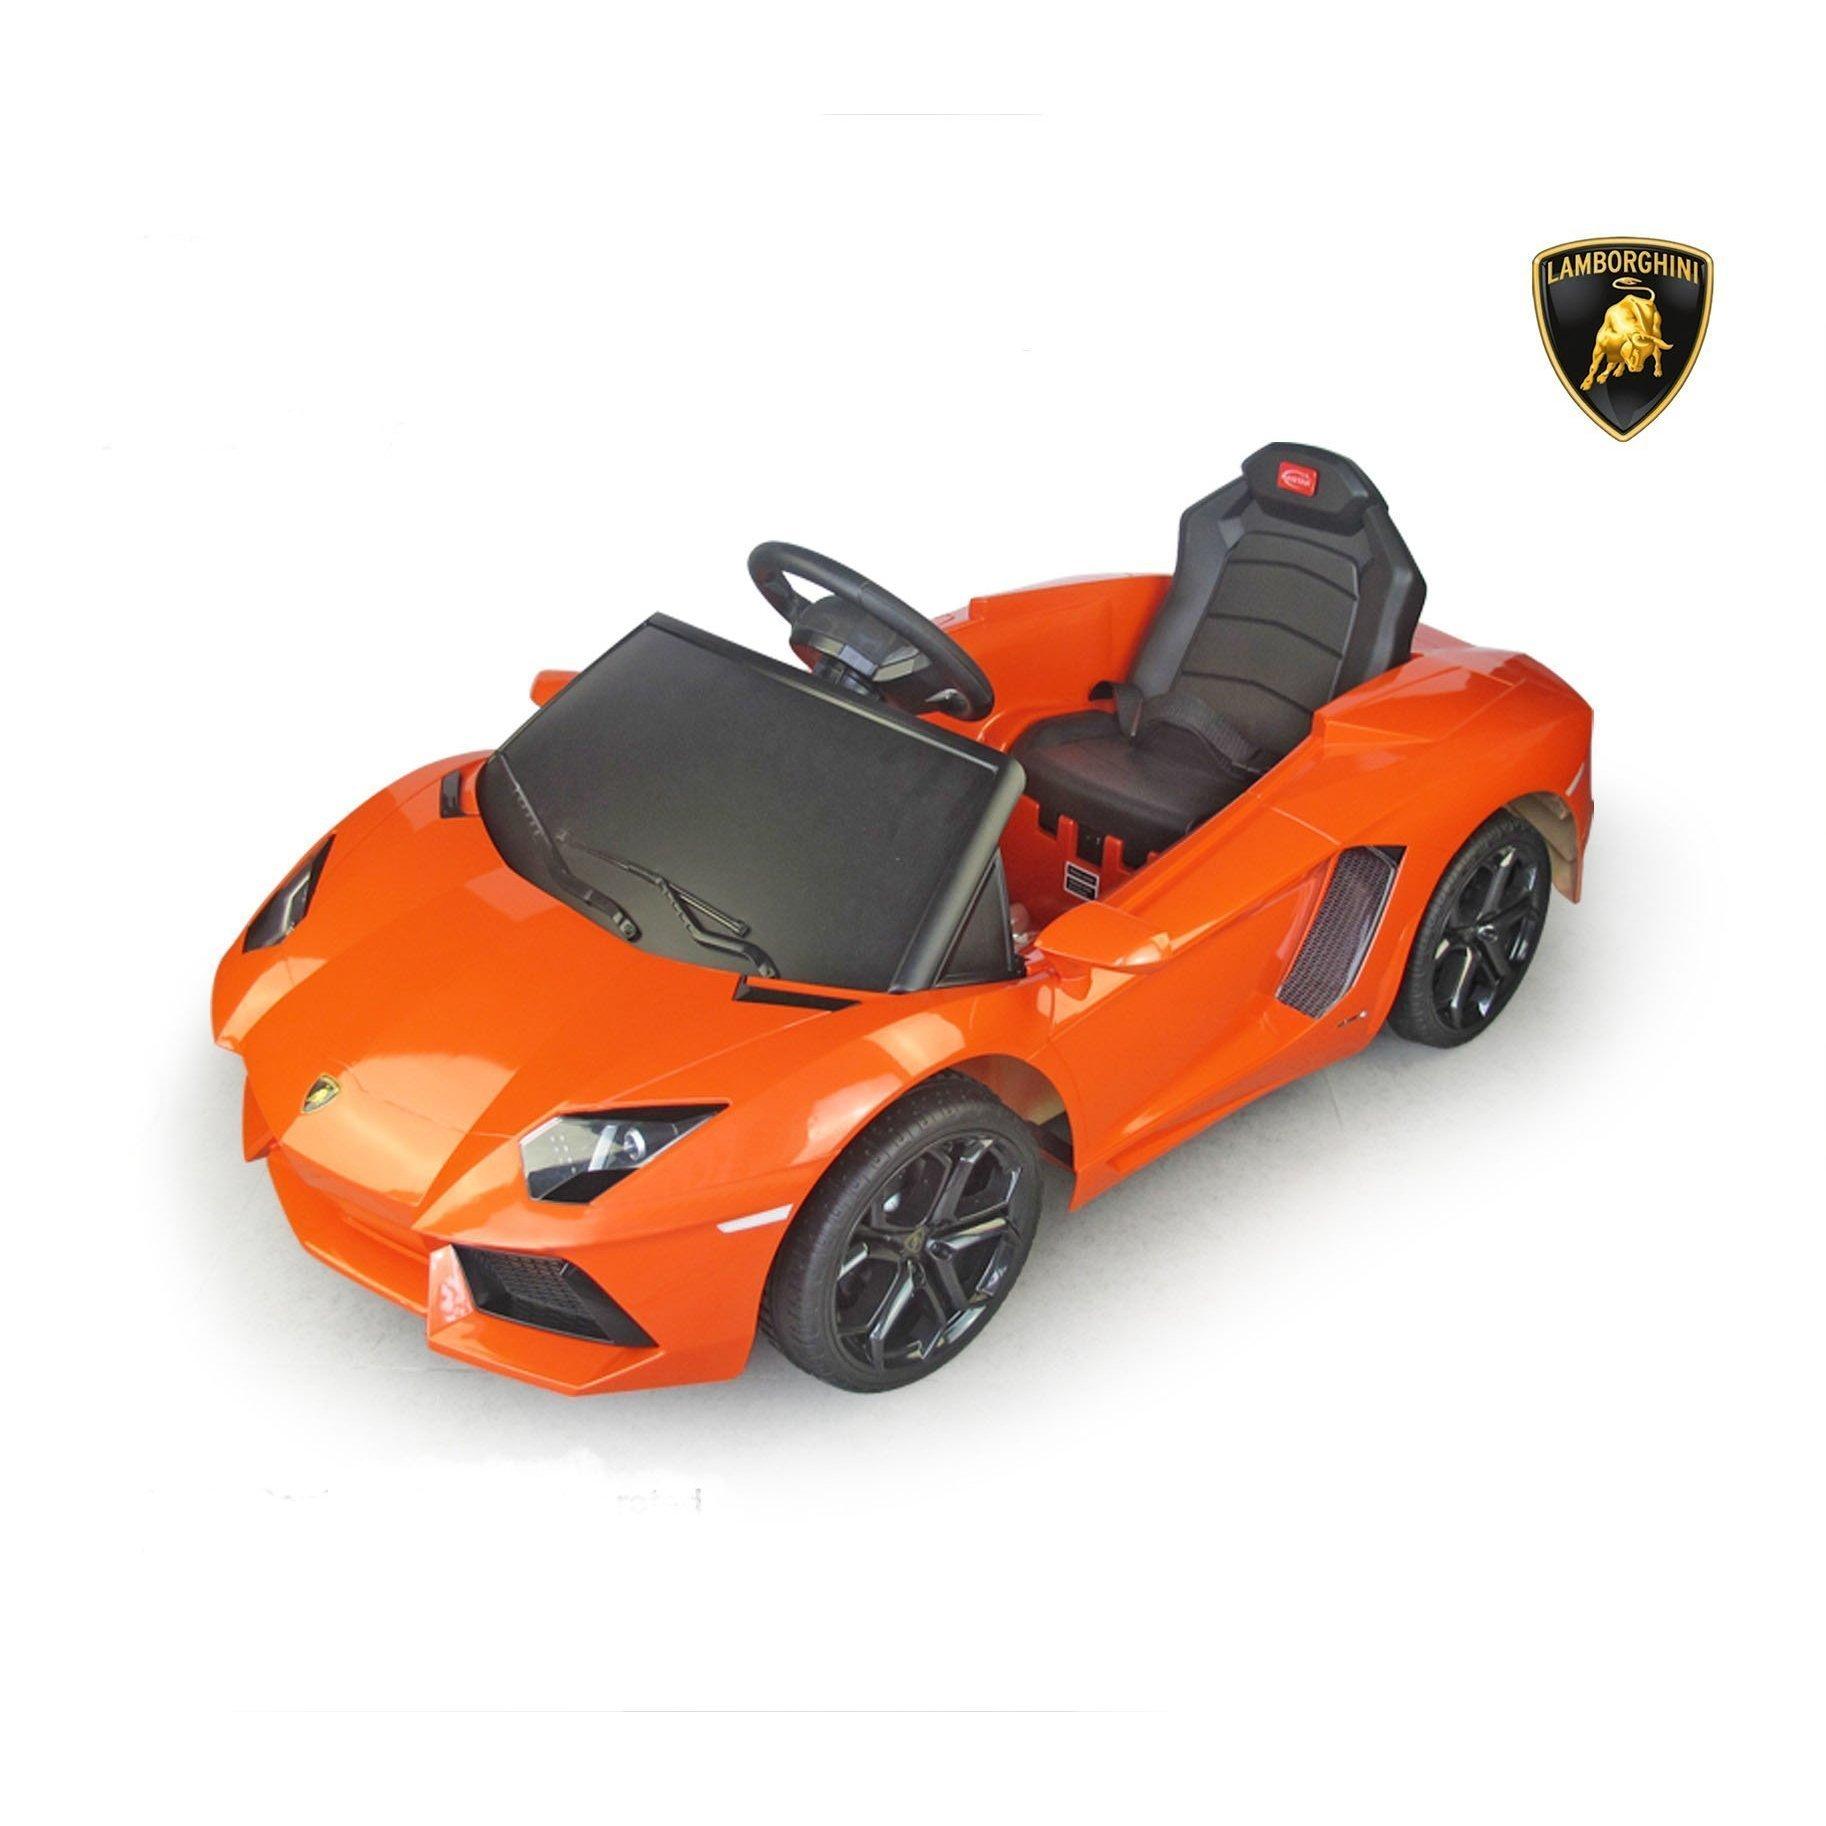 Licensed Lamborghini Aventador 6V Kids Battery Powered Ride On Car in Orange